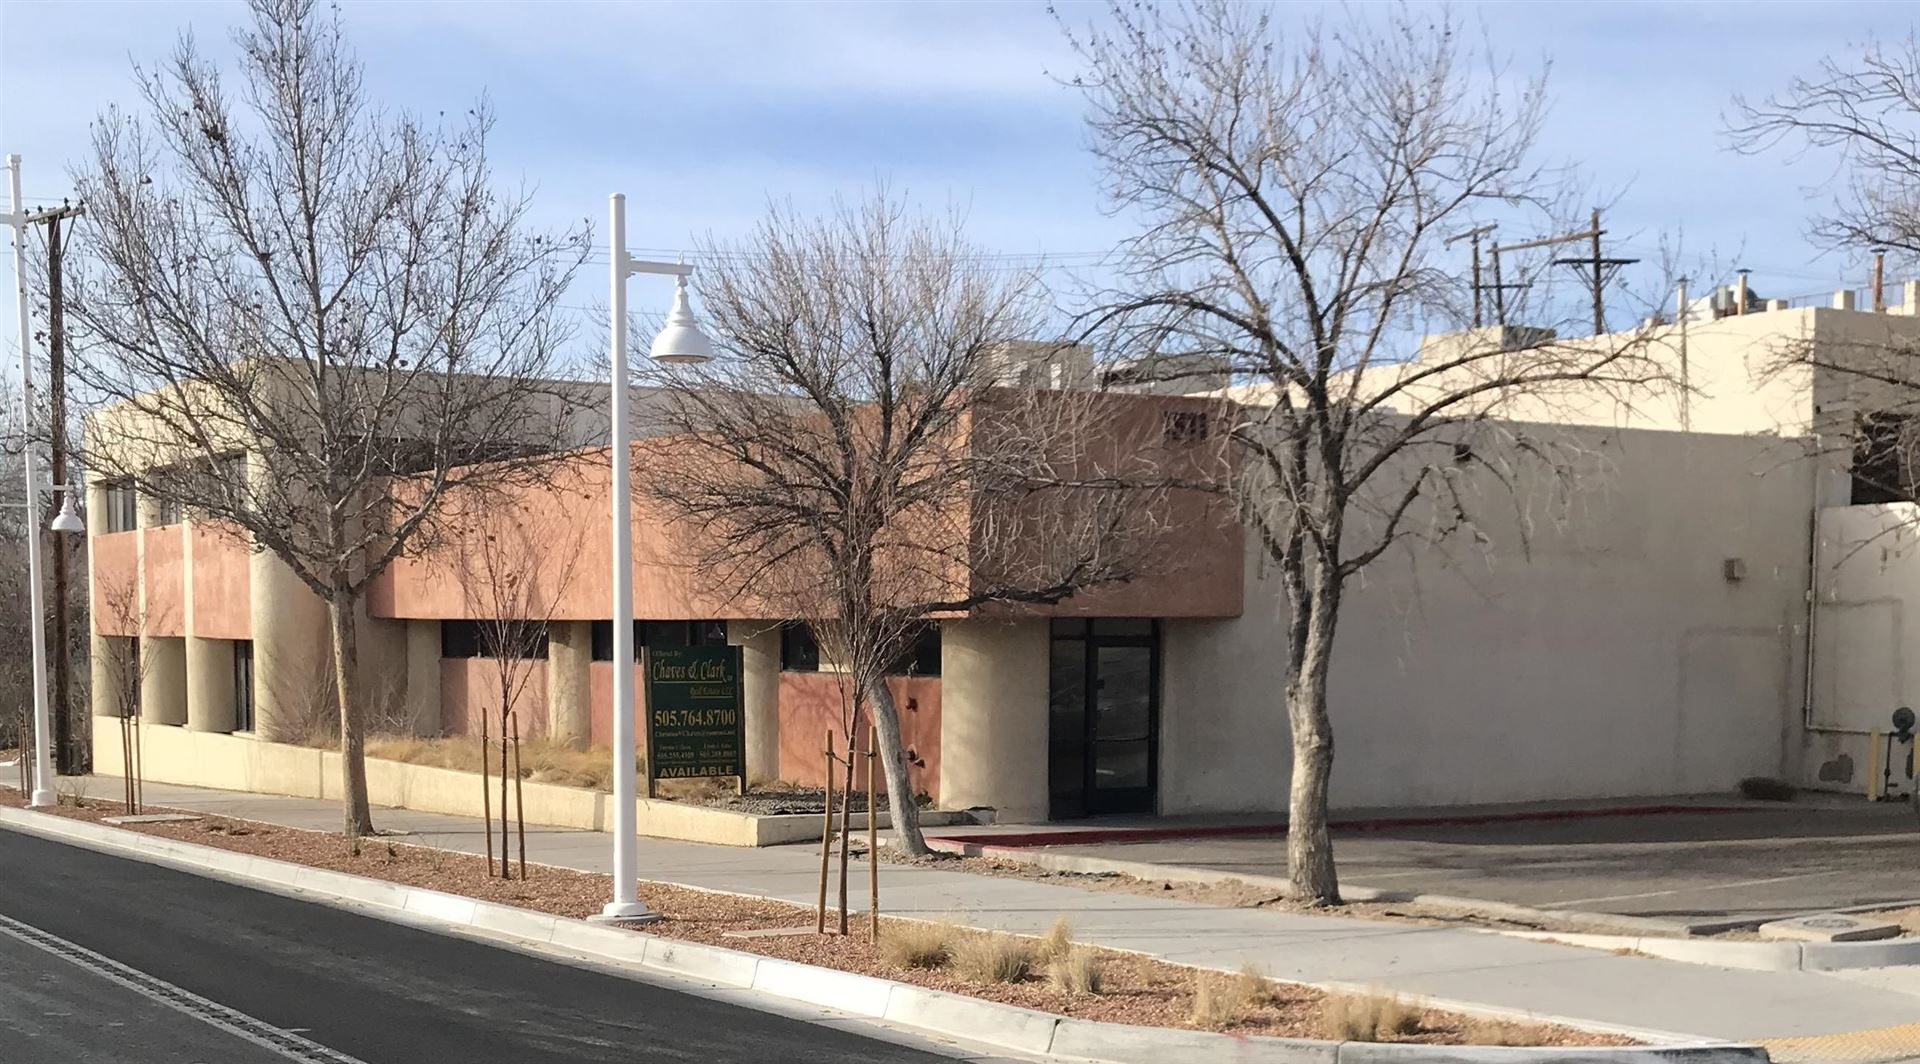 Photo for 1511 Central Avenue NE, Albuquerque, NM 87106 (MLS # 910088)